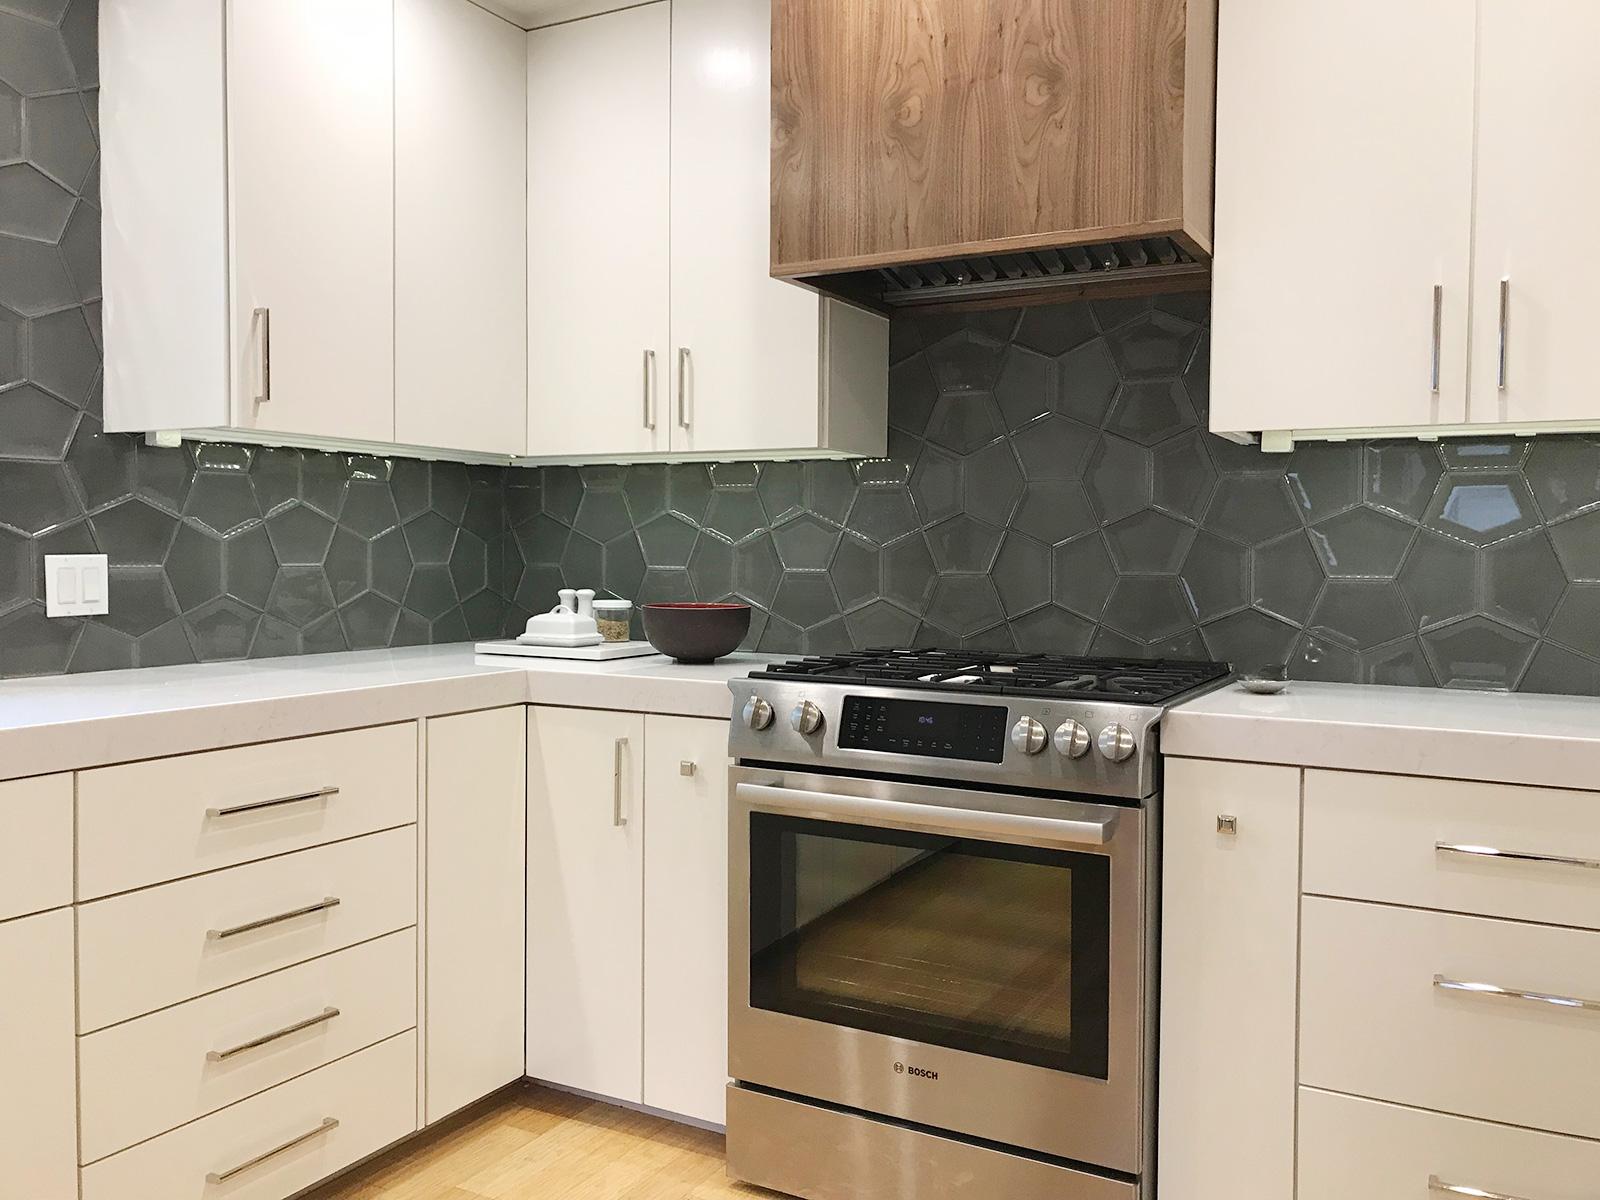 Hood Surround and Corner Cabinets